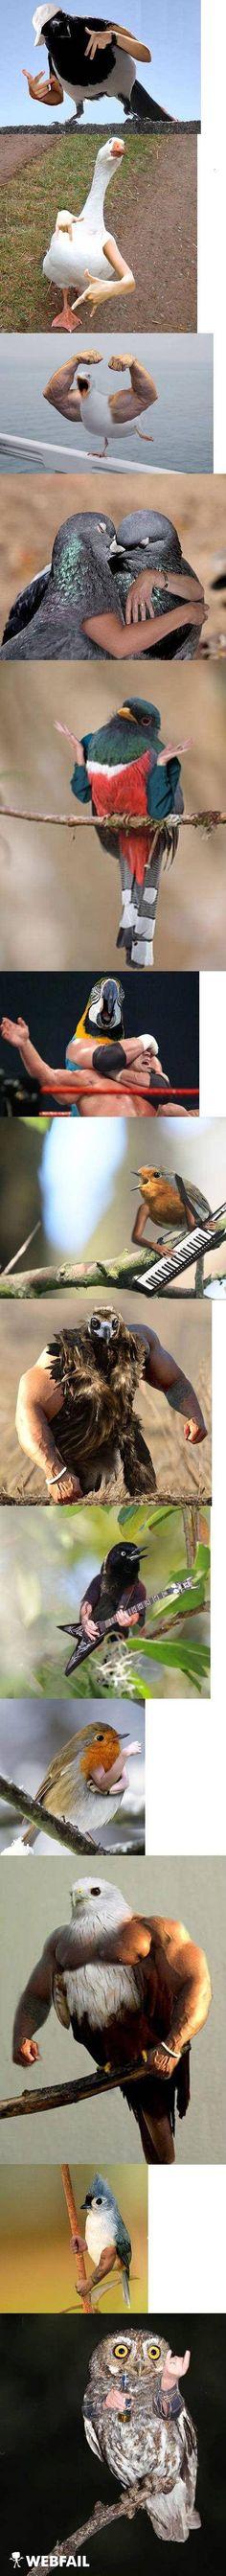 Vögel mit Armen - birds with arms :)